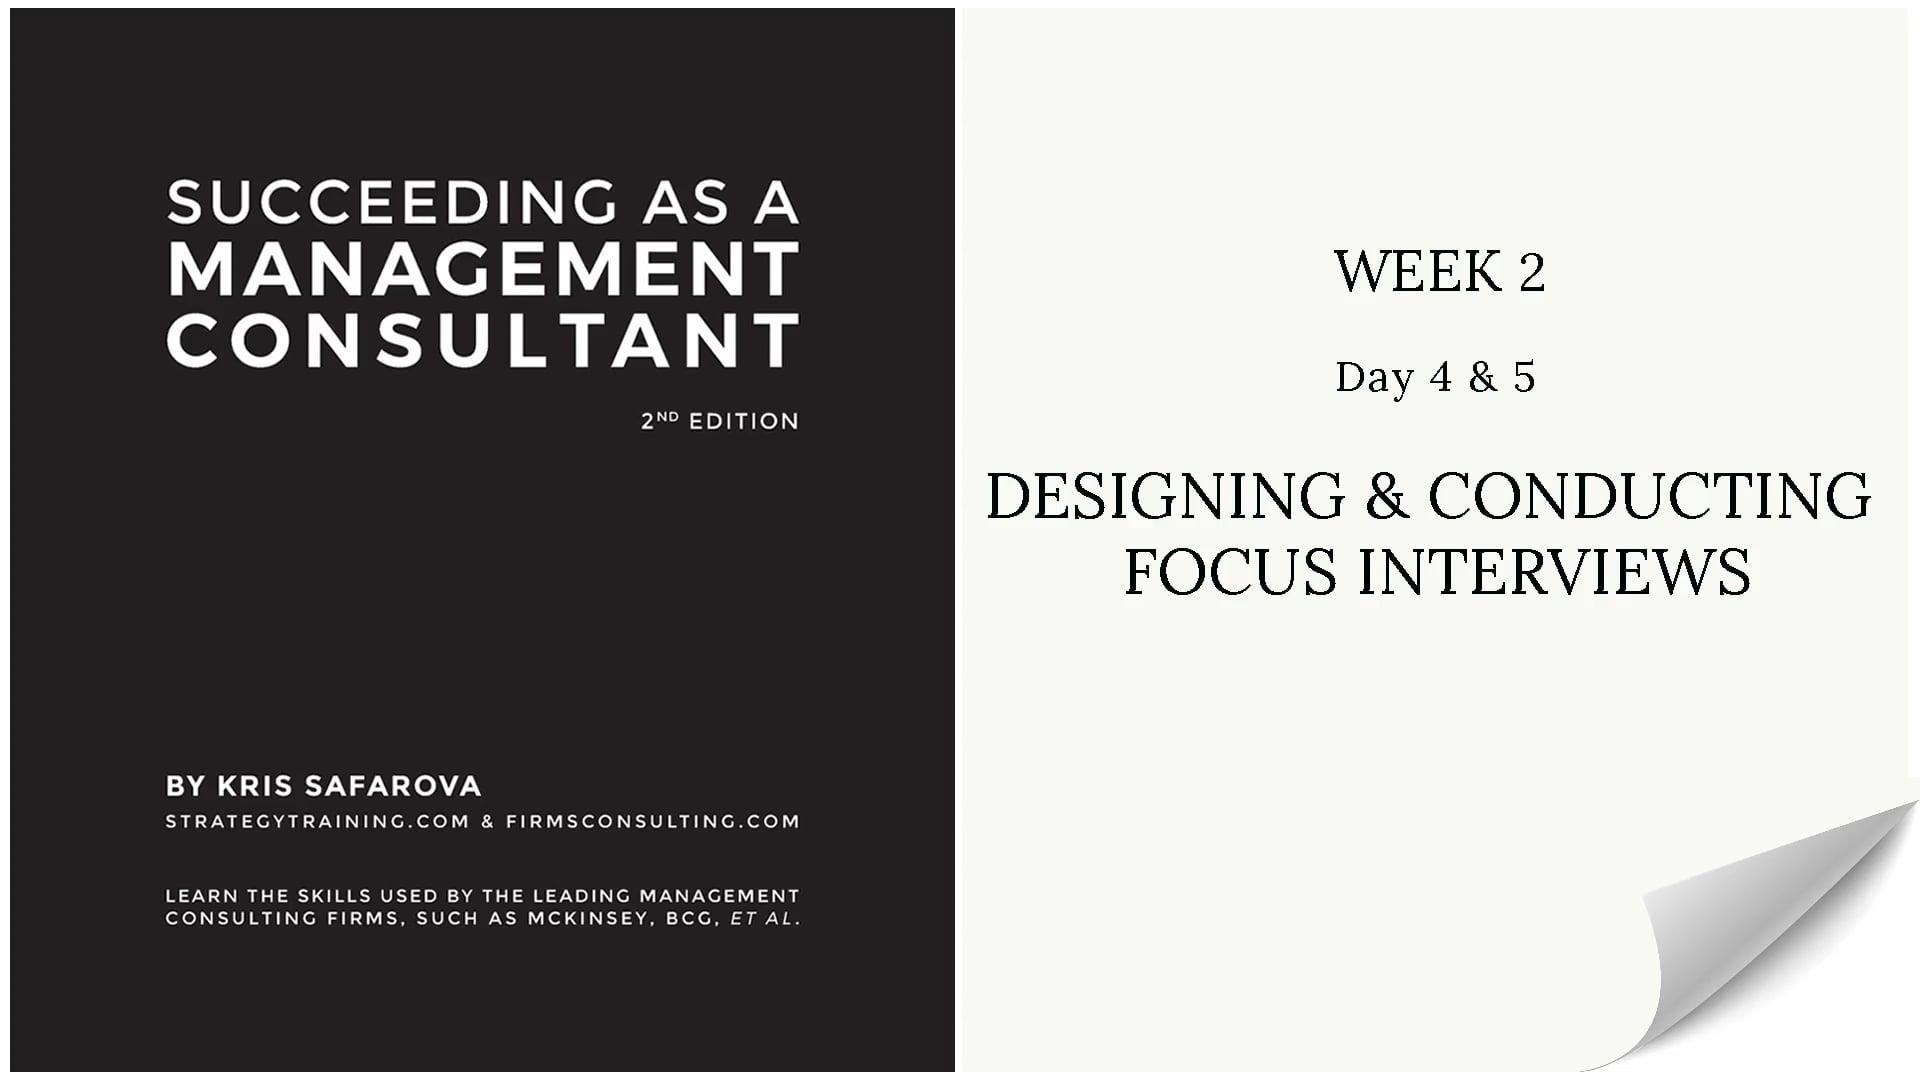 021 SAAMC Week 2 - Day 4 & 5 Designin...